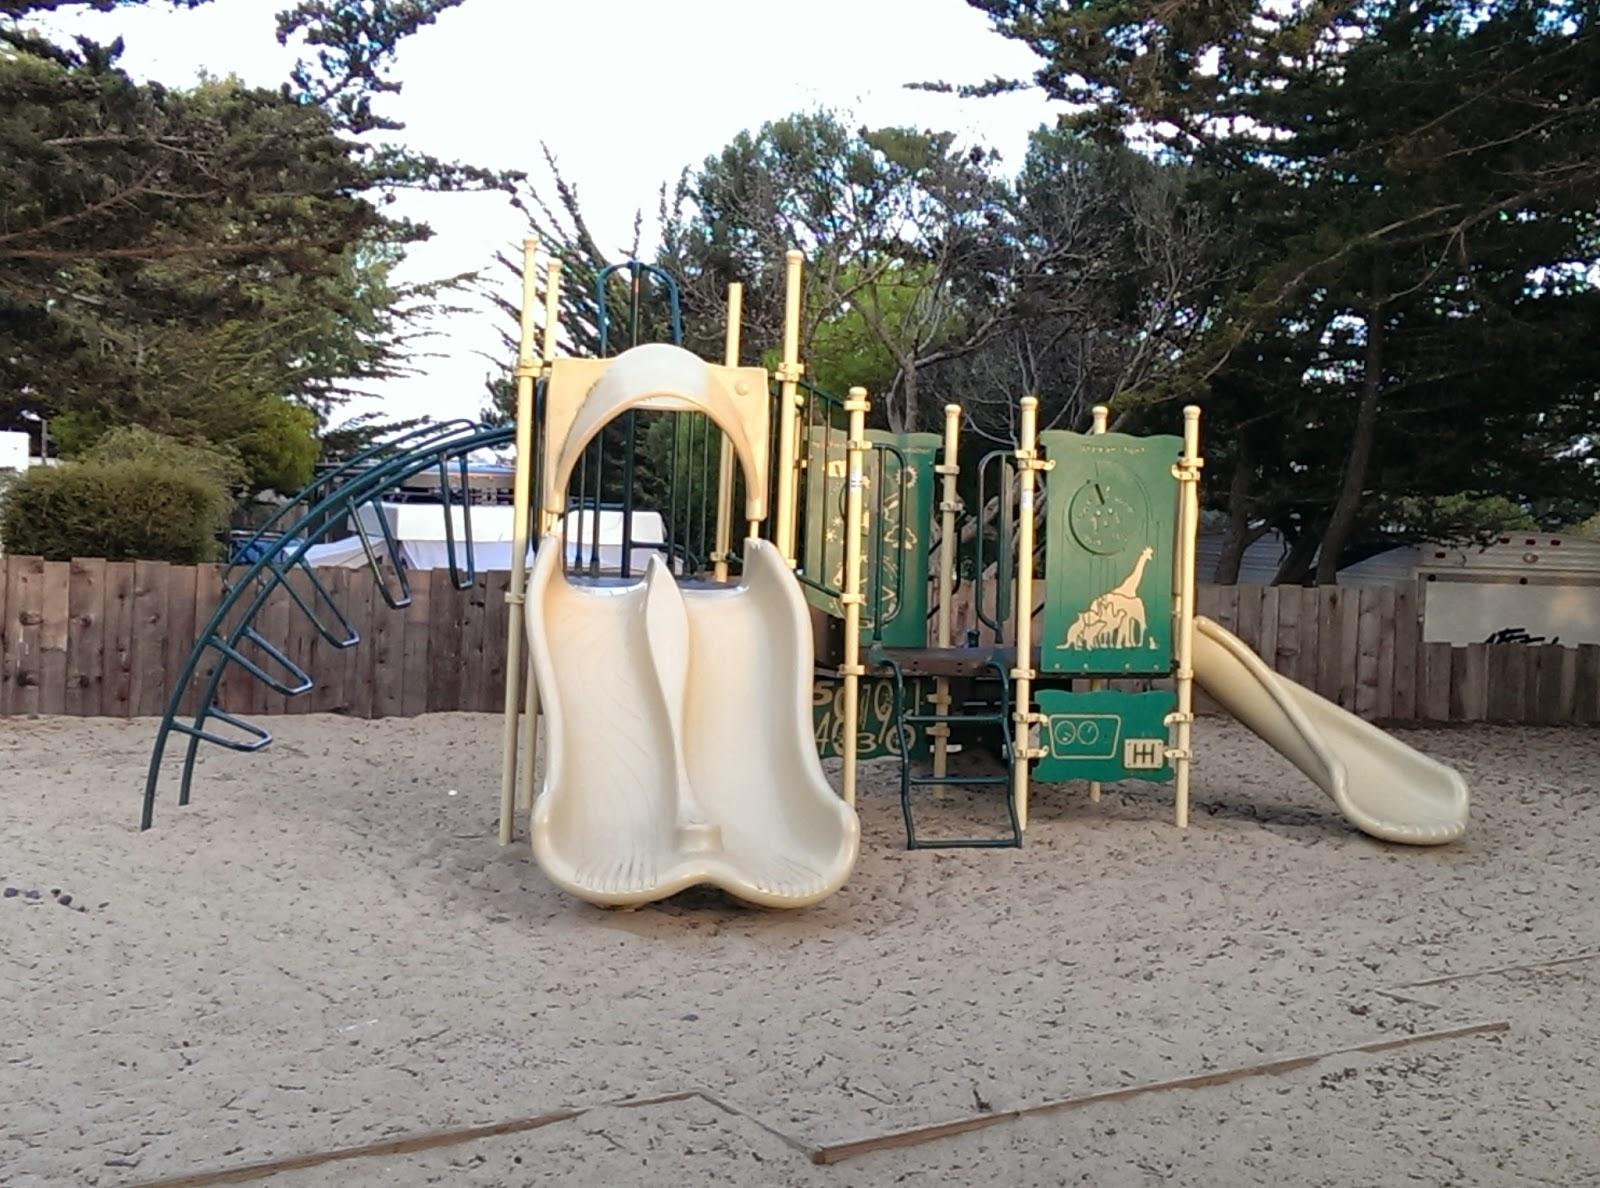 Monterey. Camping, RVing, Rentals, Marina Dunes, Beach, park